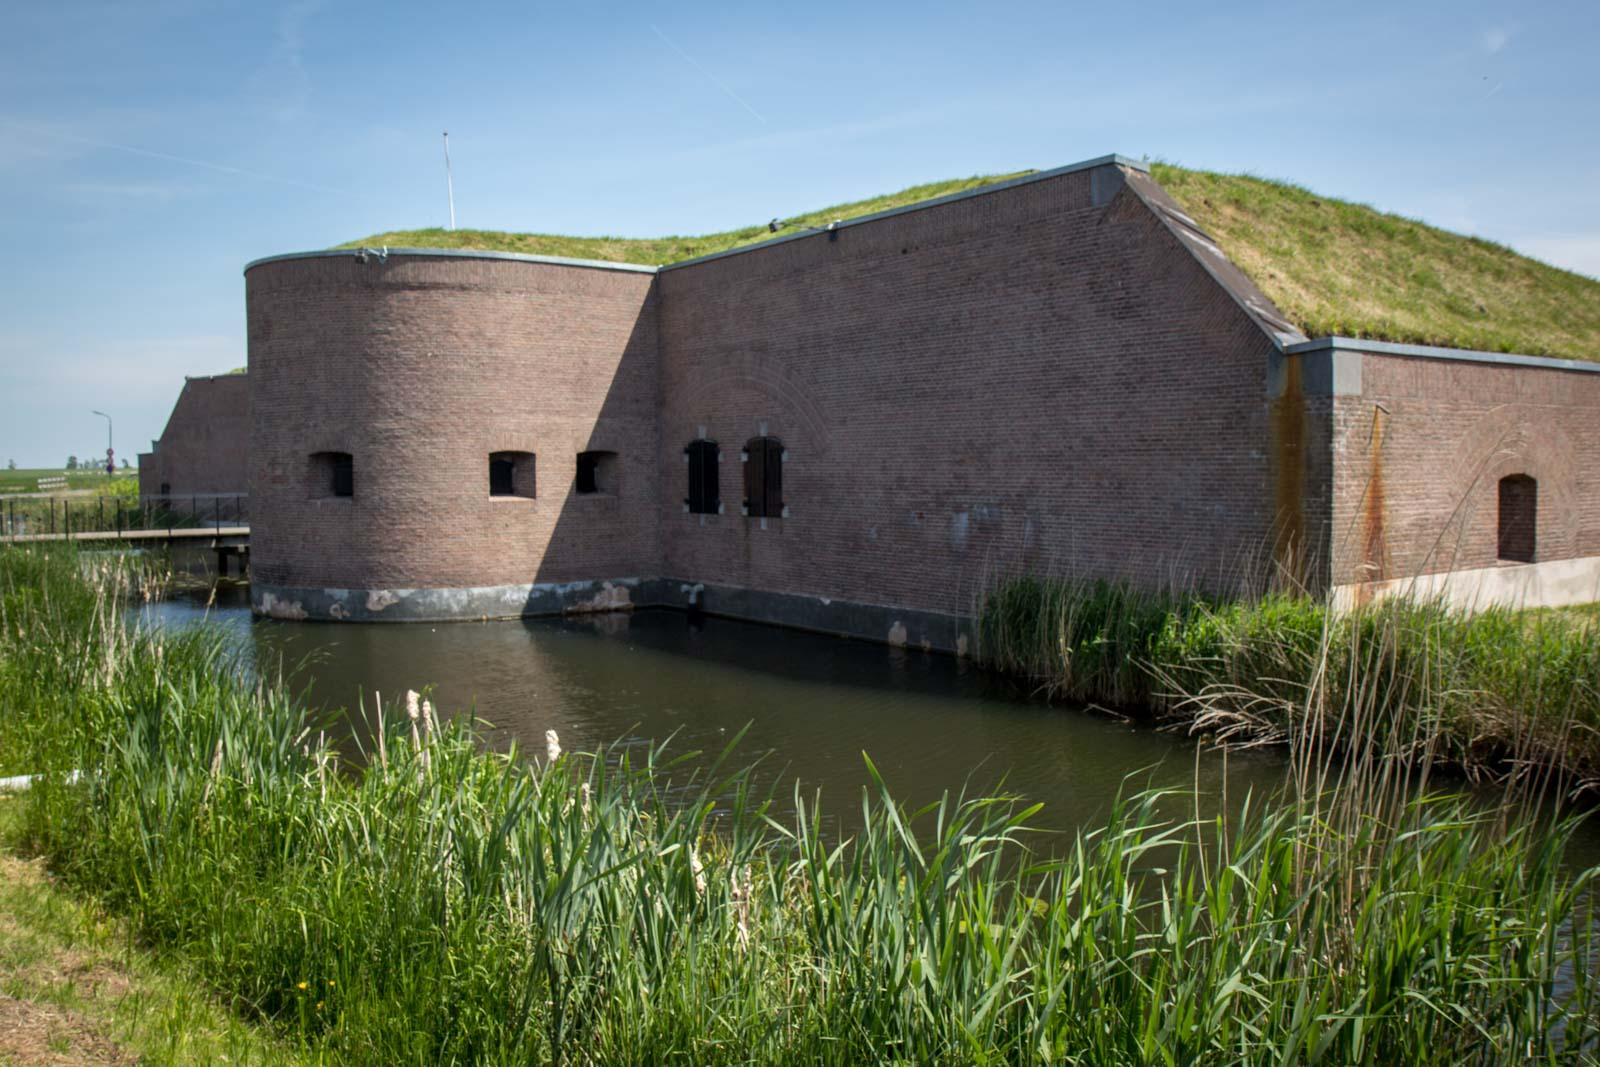 Amsterdam Defence Line, Pampus Island, Netherlands